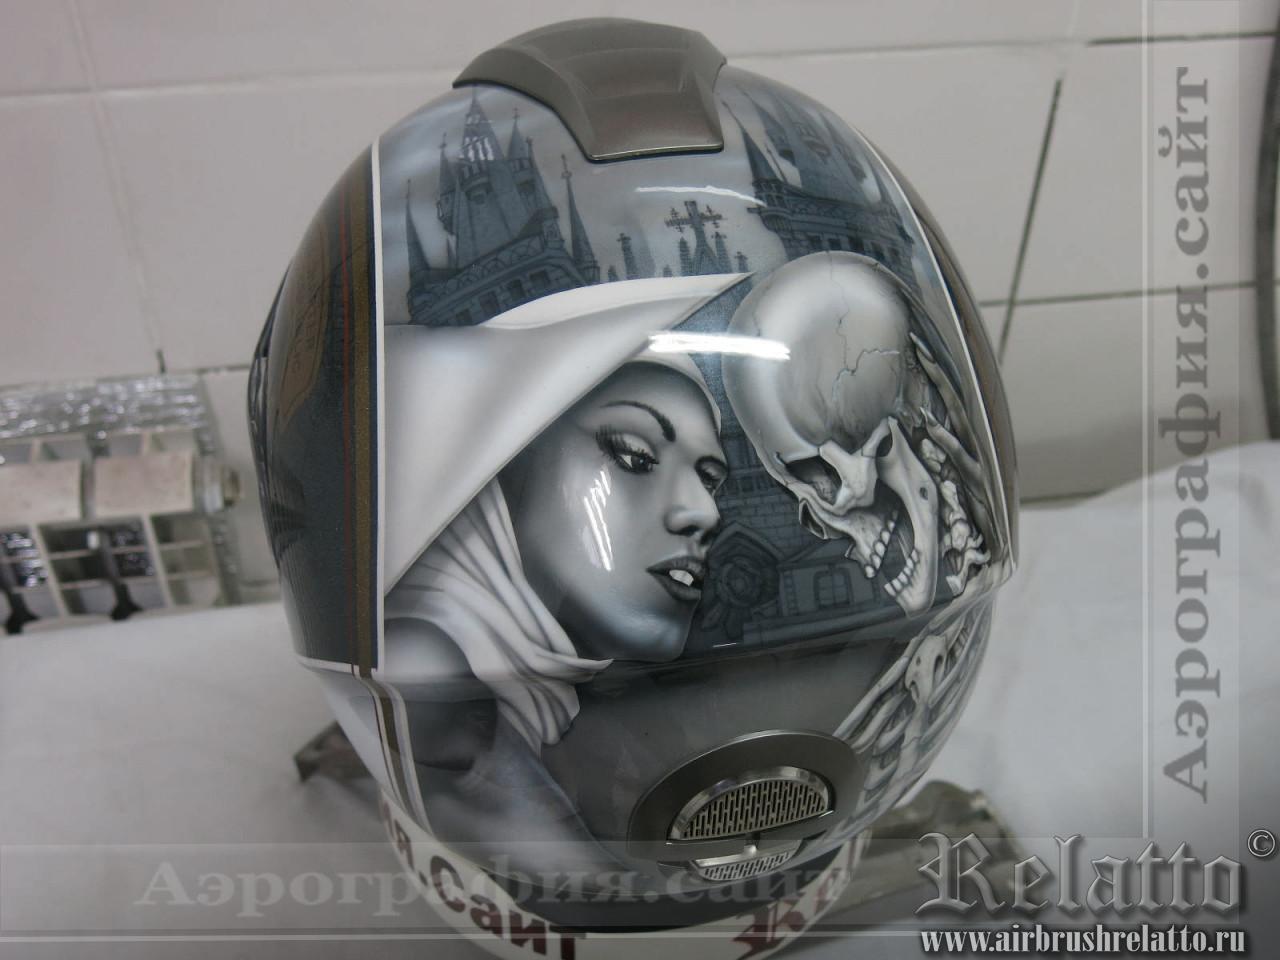 аэрография шлема монашка и скелет